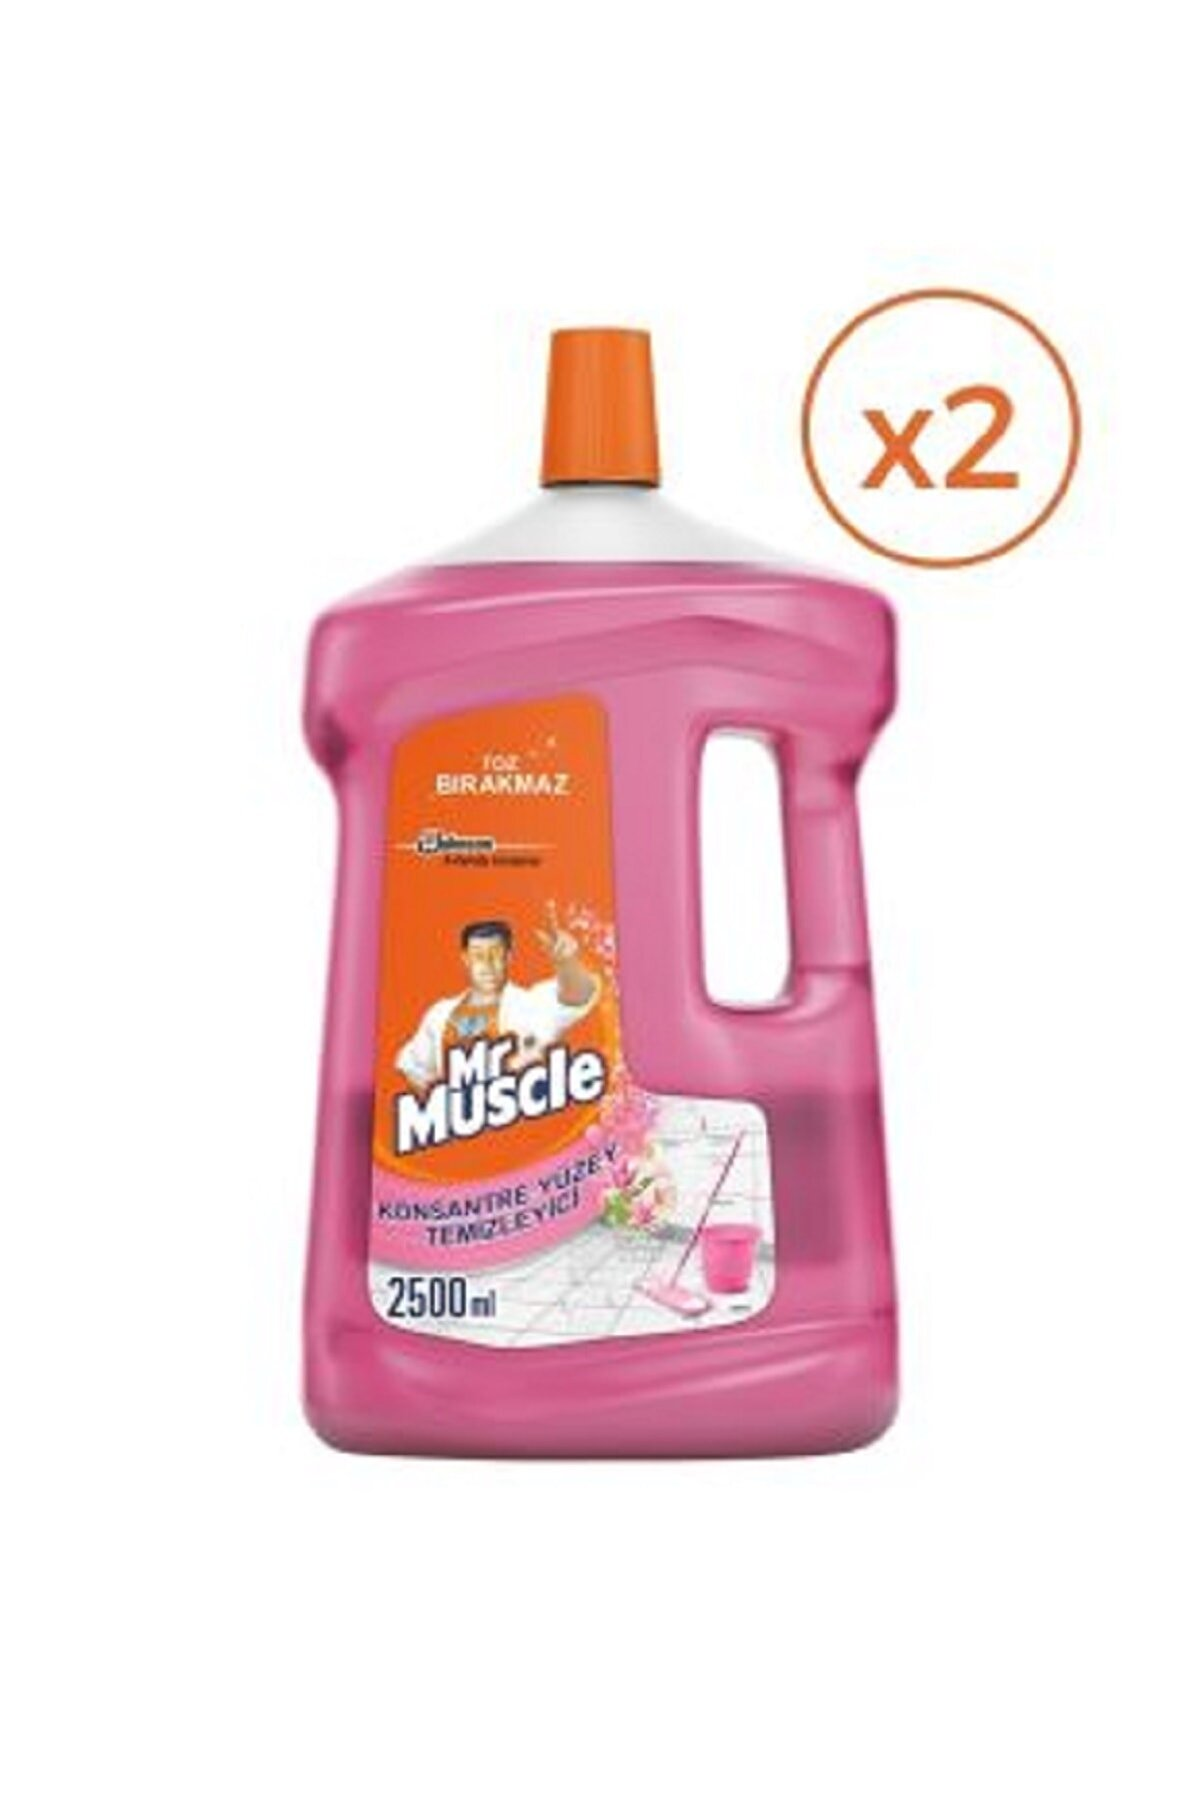 Mr. Muscle Konsantre Yüzey Temizleyici Floral Buket - 2500 ml x 2'li